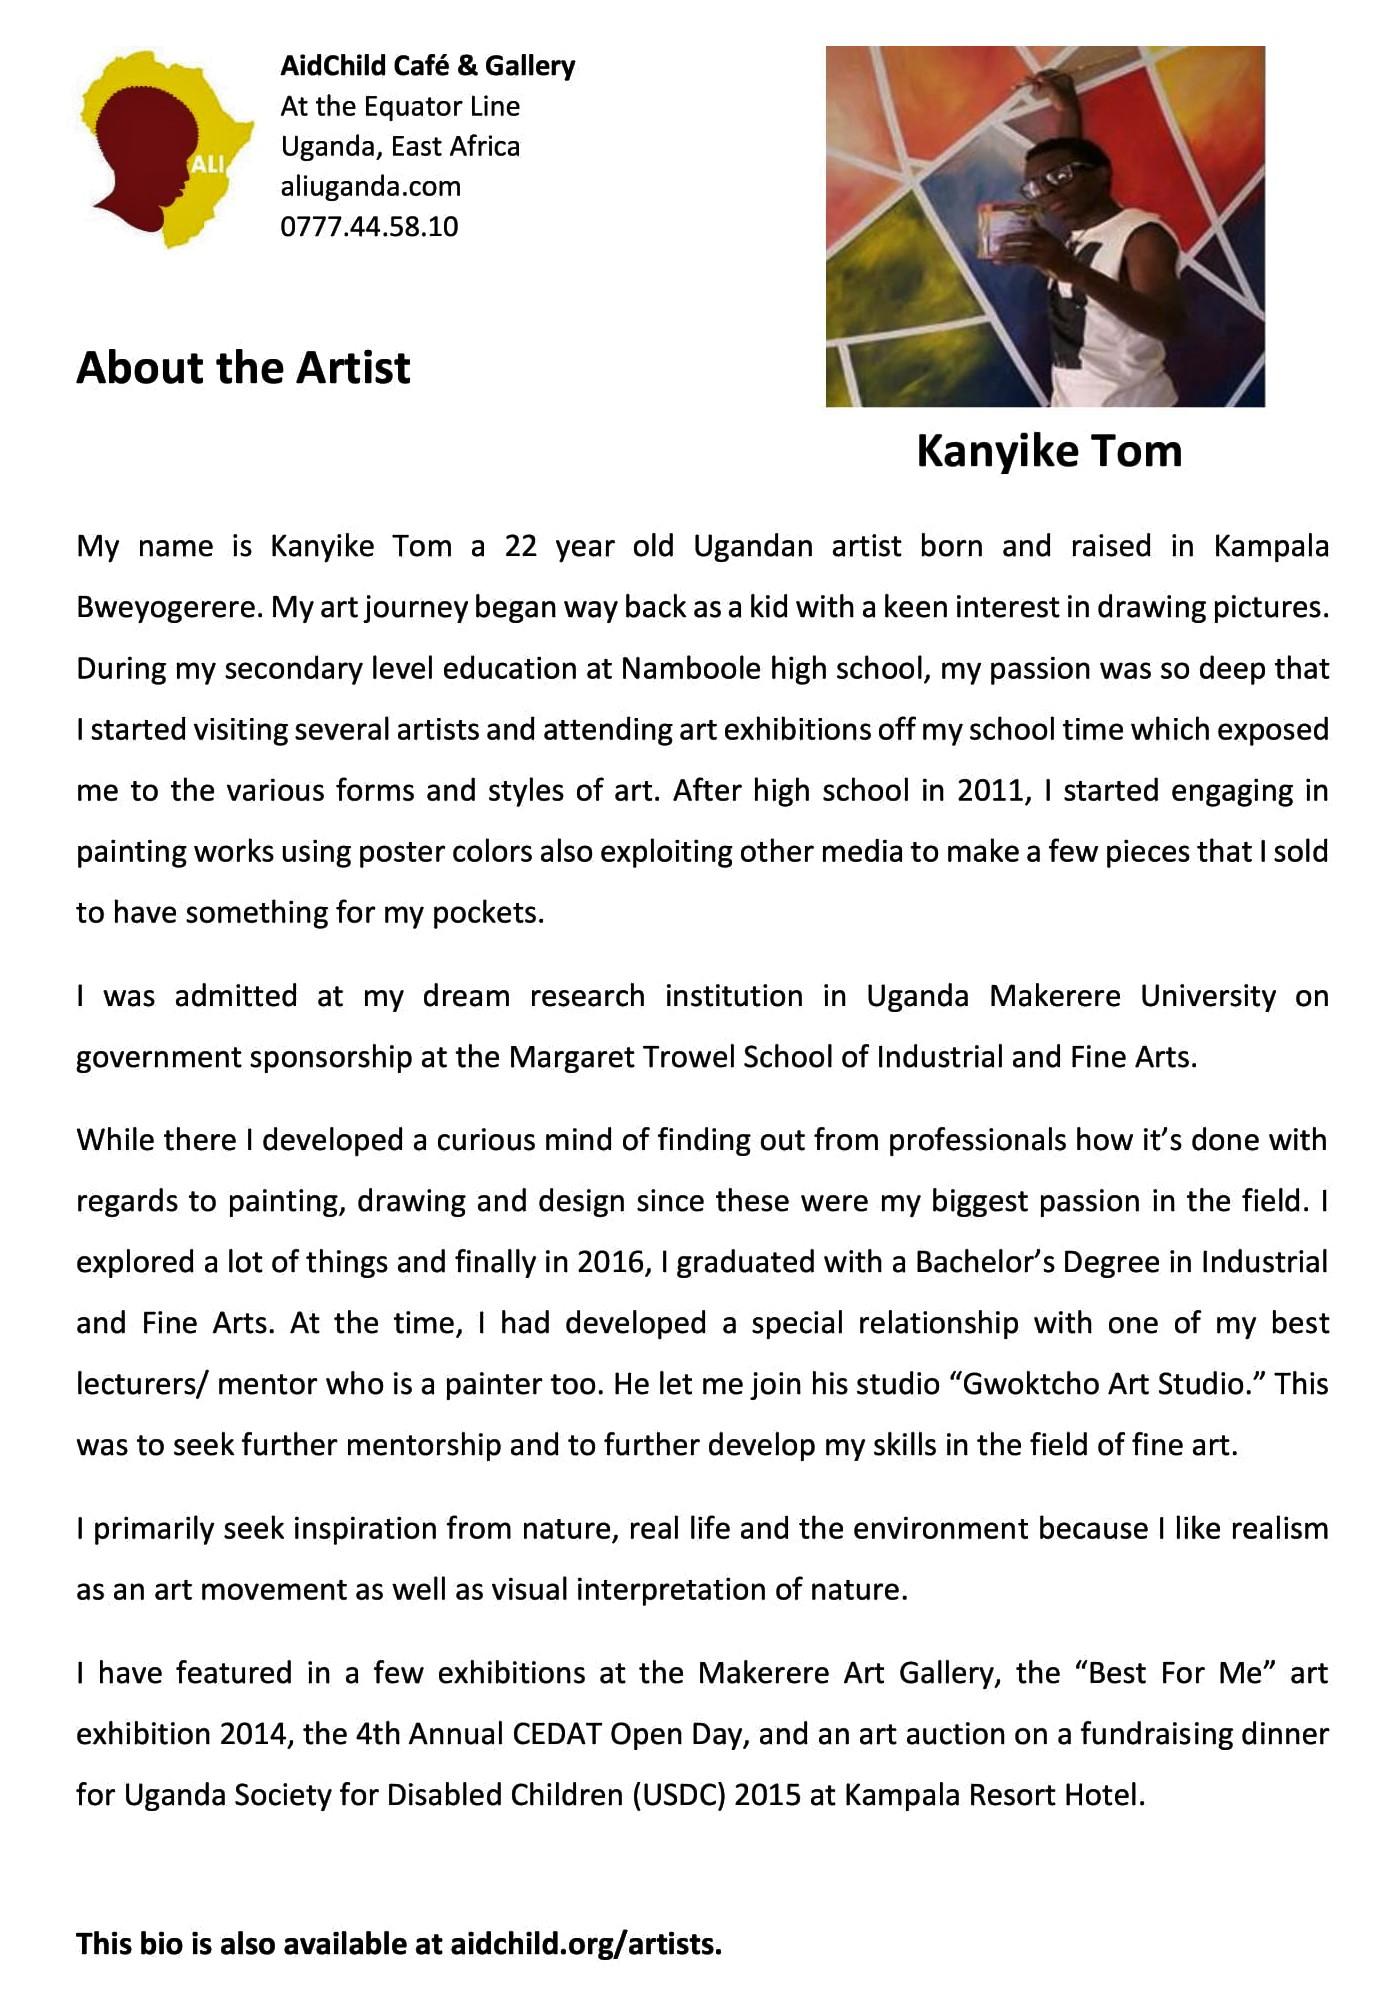 About the Artists - ALIUGANDA COM - The AidChild Leadership